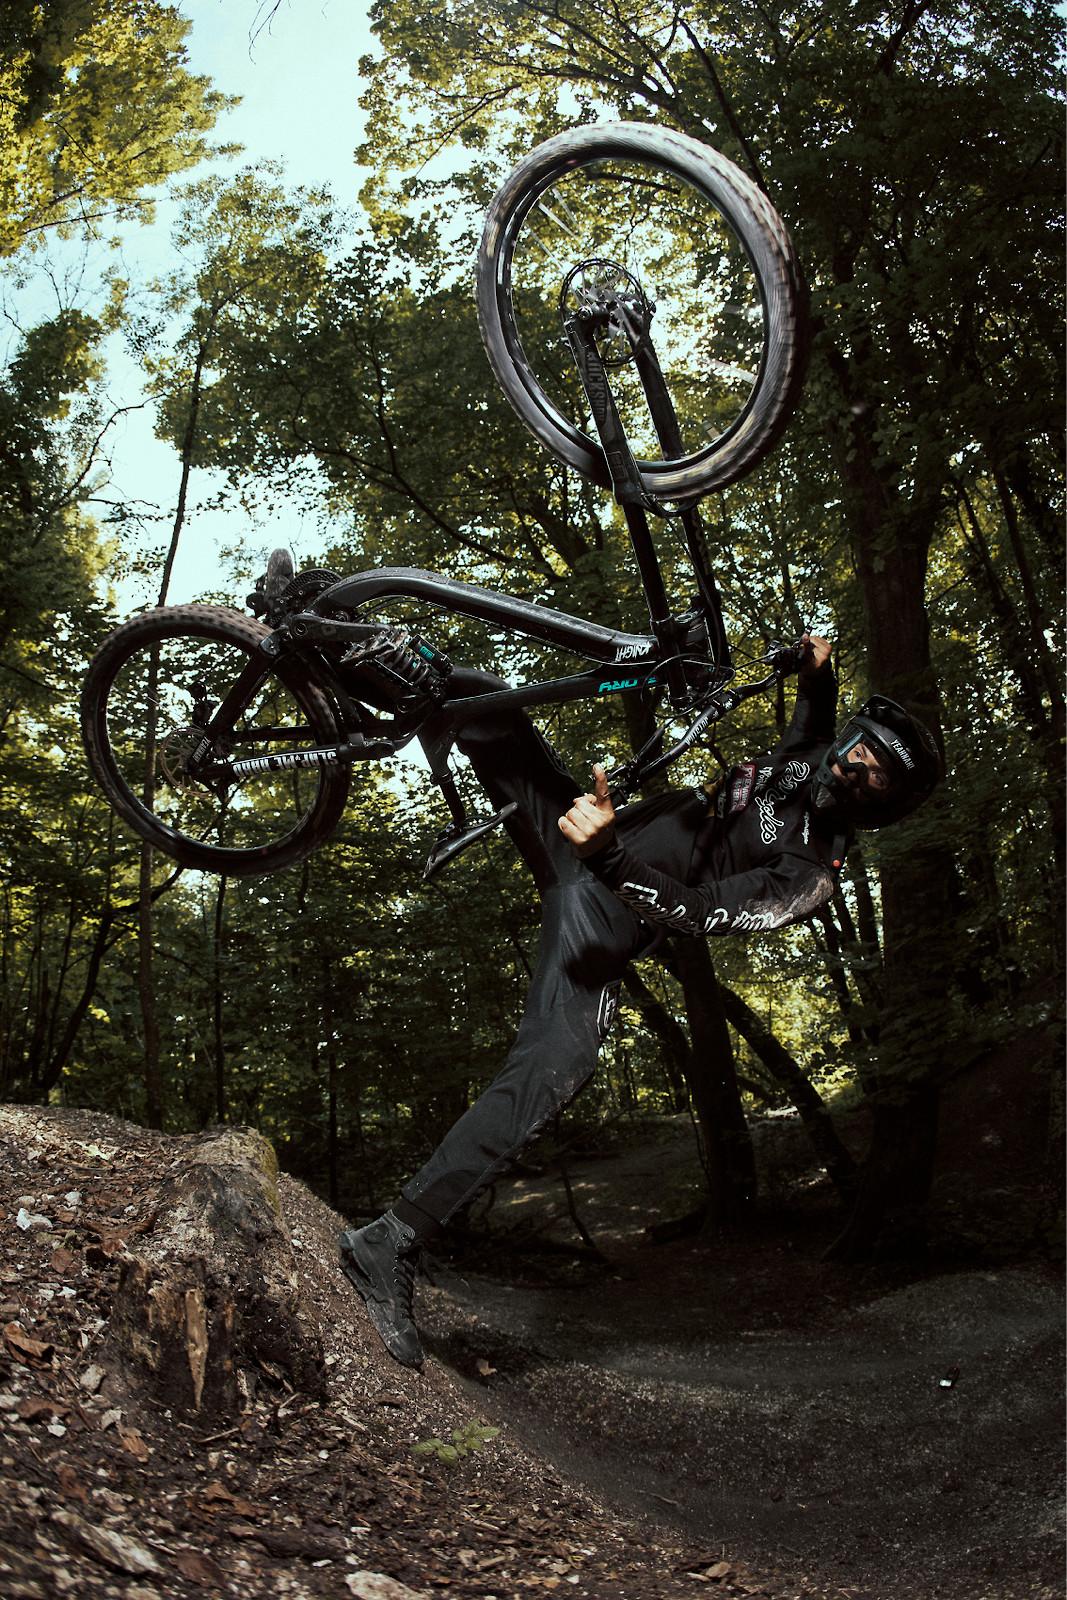 Steyning Trails - DomKniight100 - Mountain Biking Pictures - Vital MTB